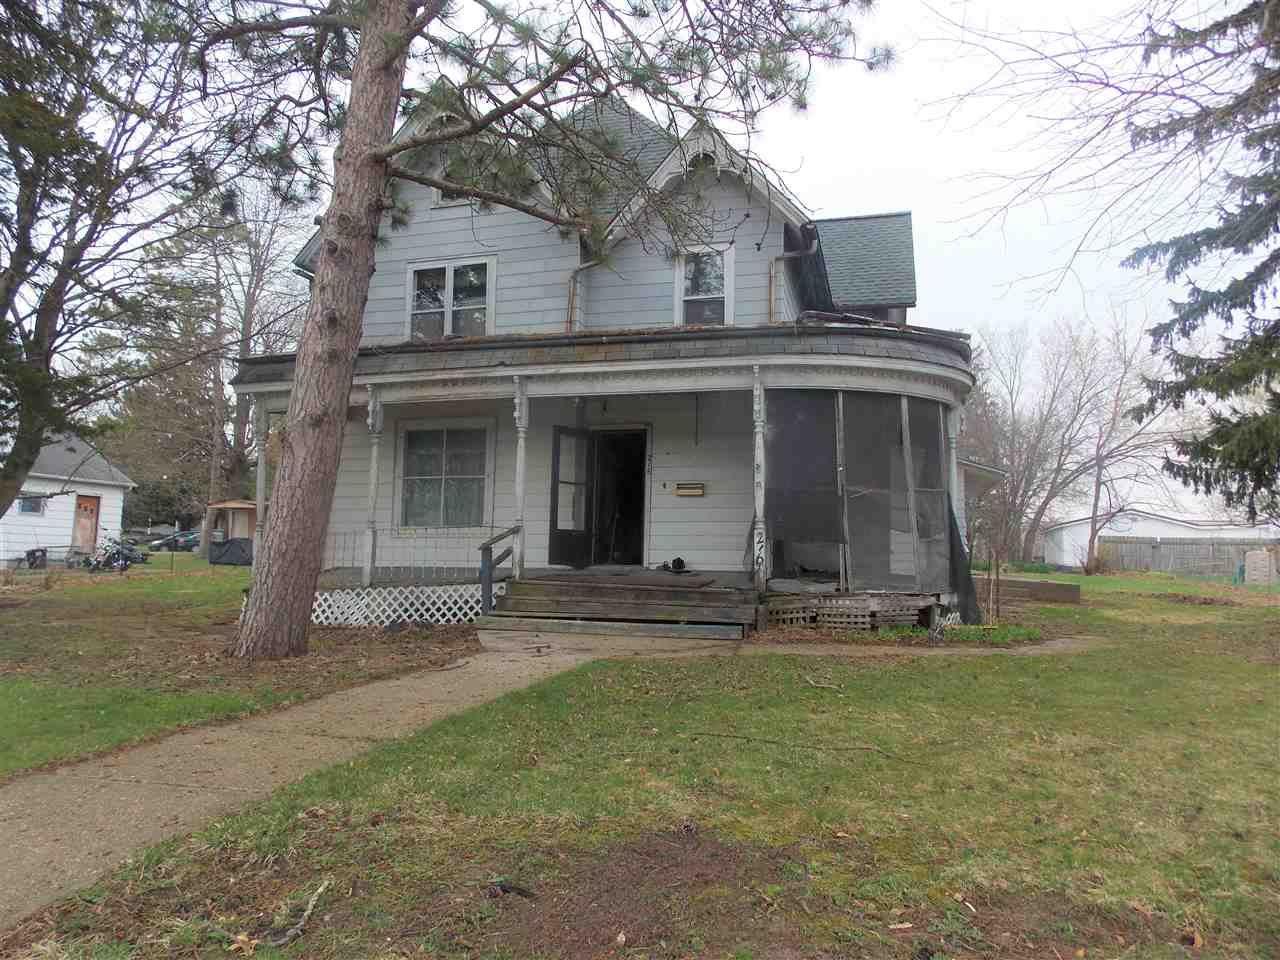 216 W Main St, Benton, WI 53803 - #: 1905998